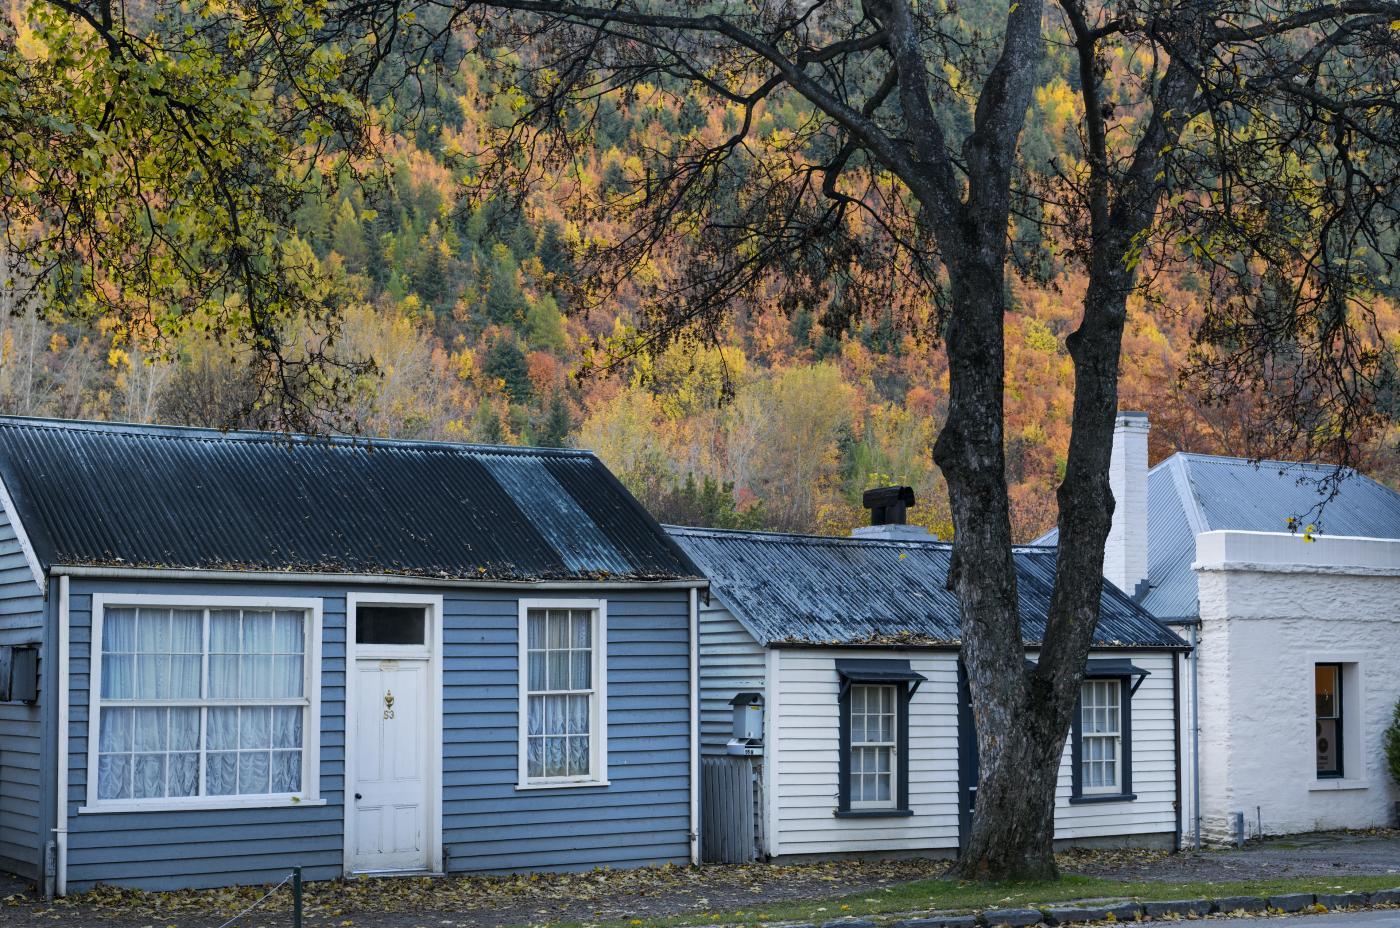 Arrowtown cottages in Autumn